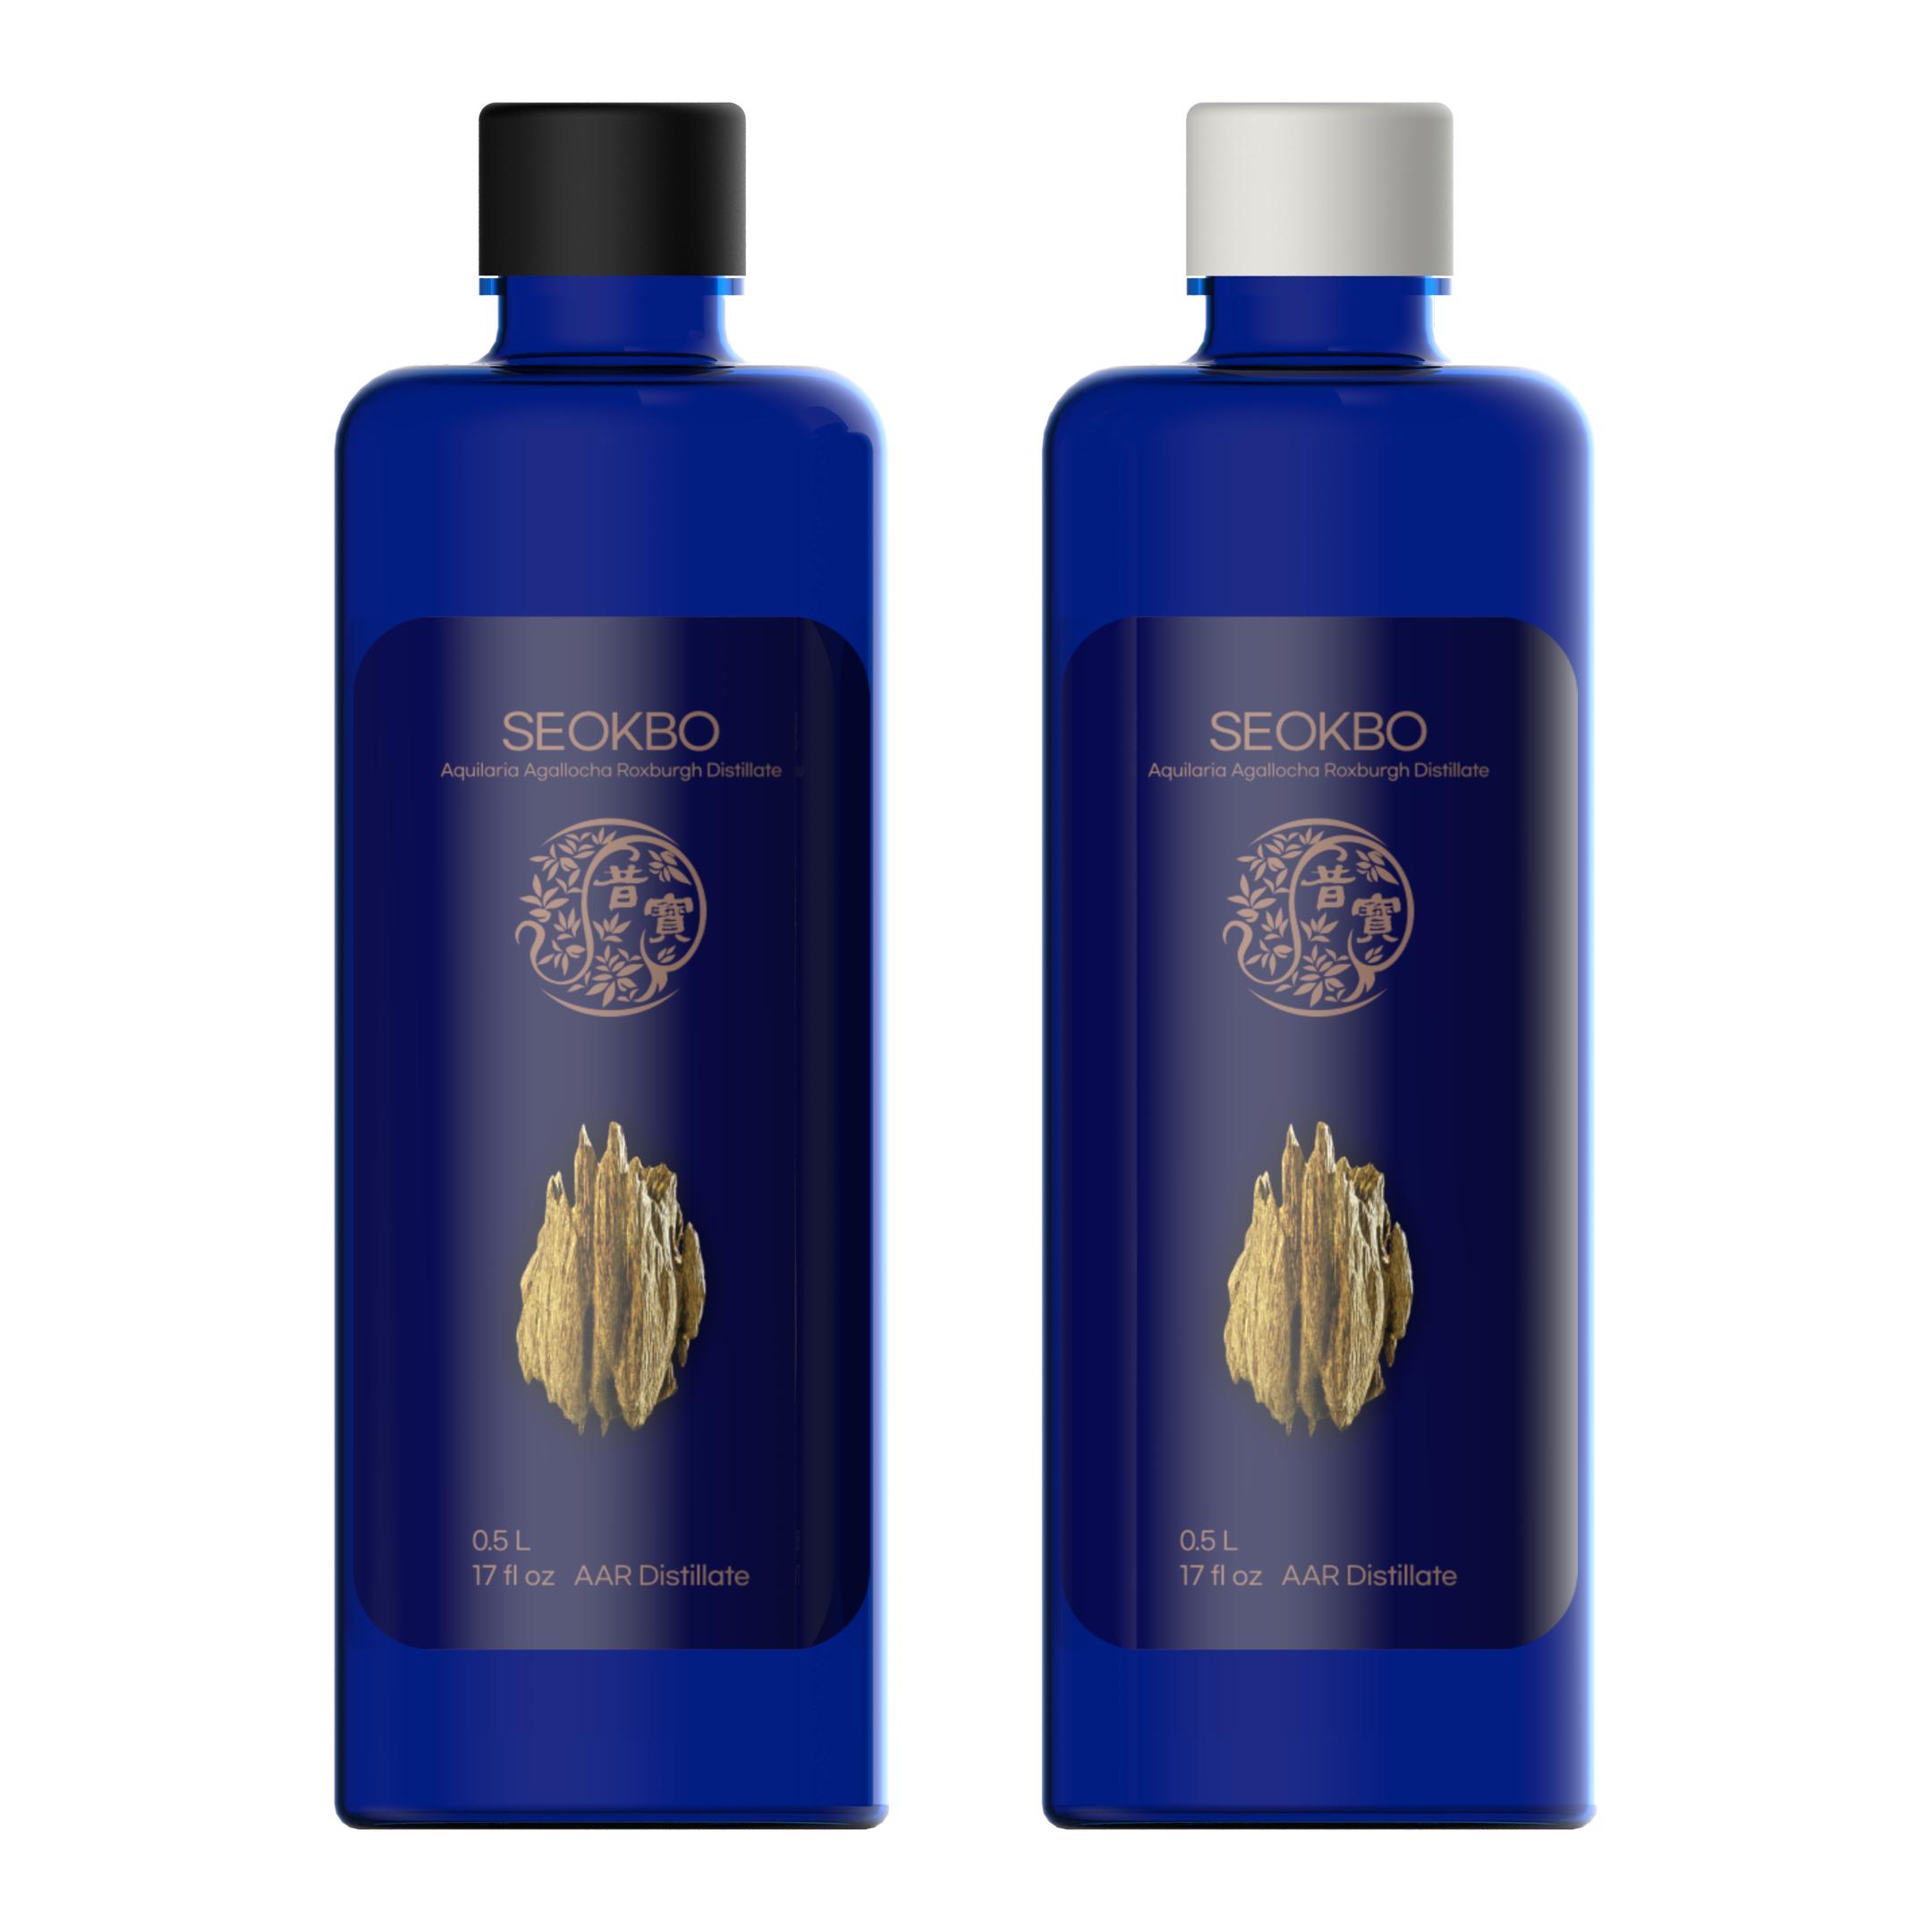 500ml, 100% Pure Natural 'Seokbo's Aquilaria Agallocha Roxbourgh (Agarwood) Distilled Water'